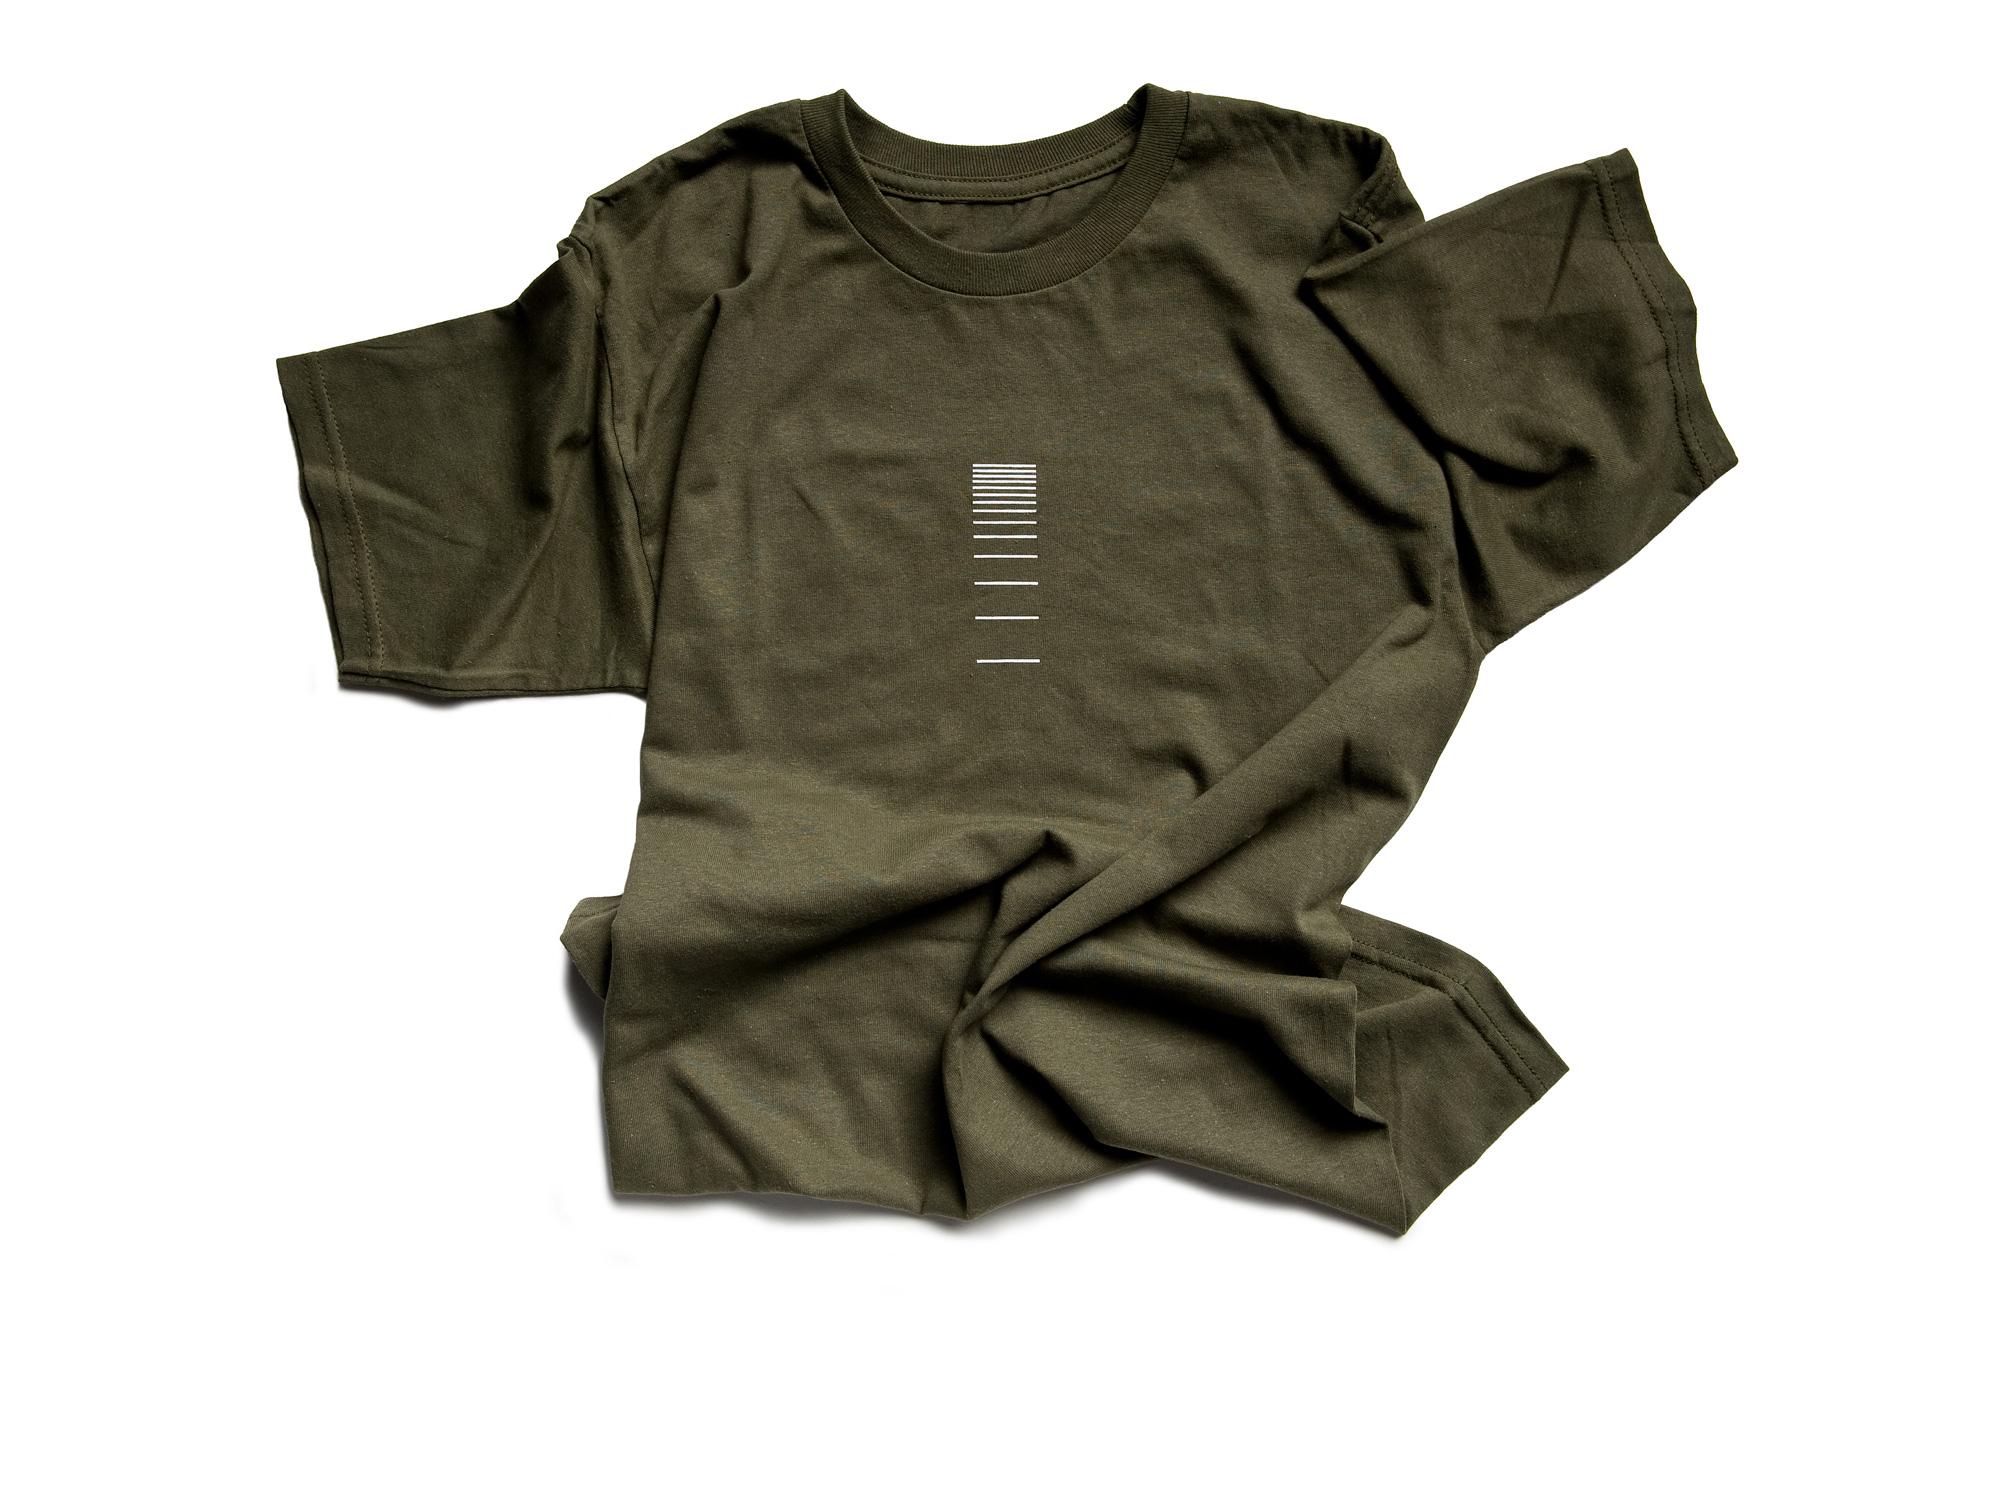 landeca_shirt